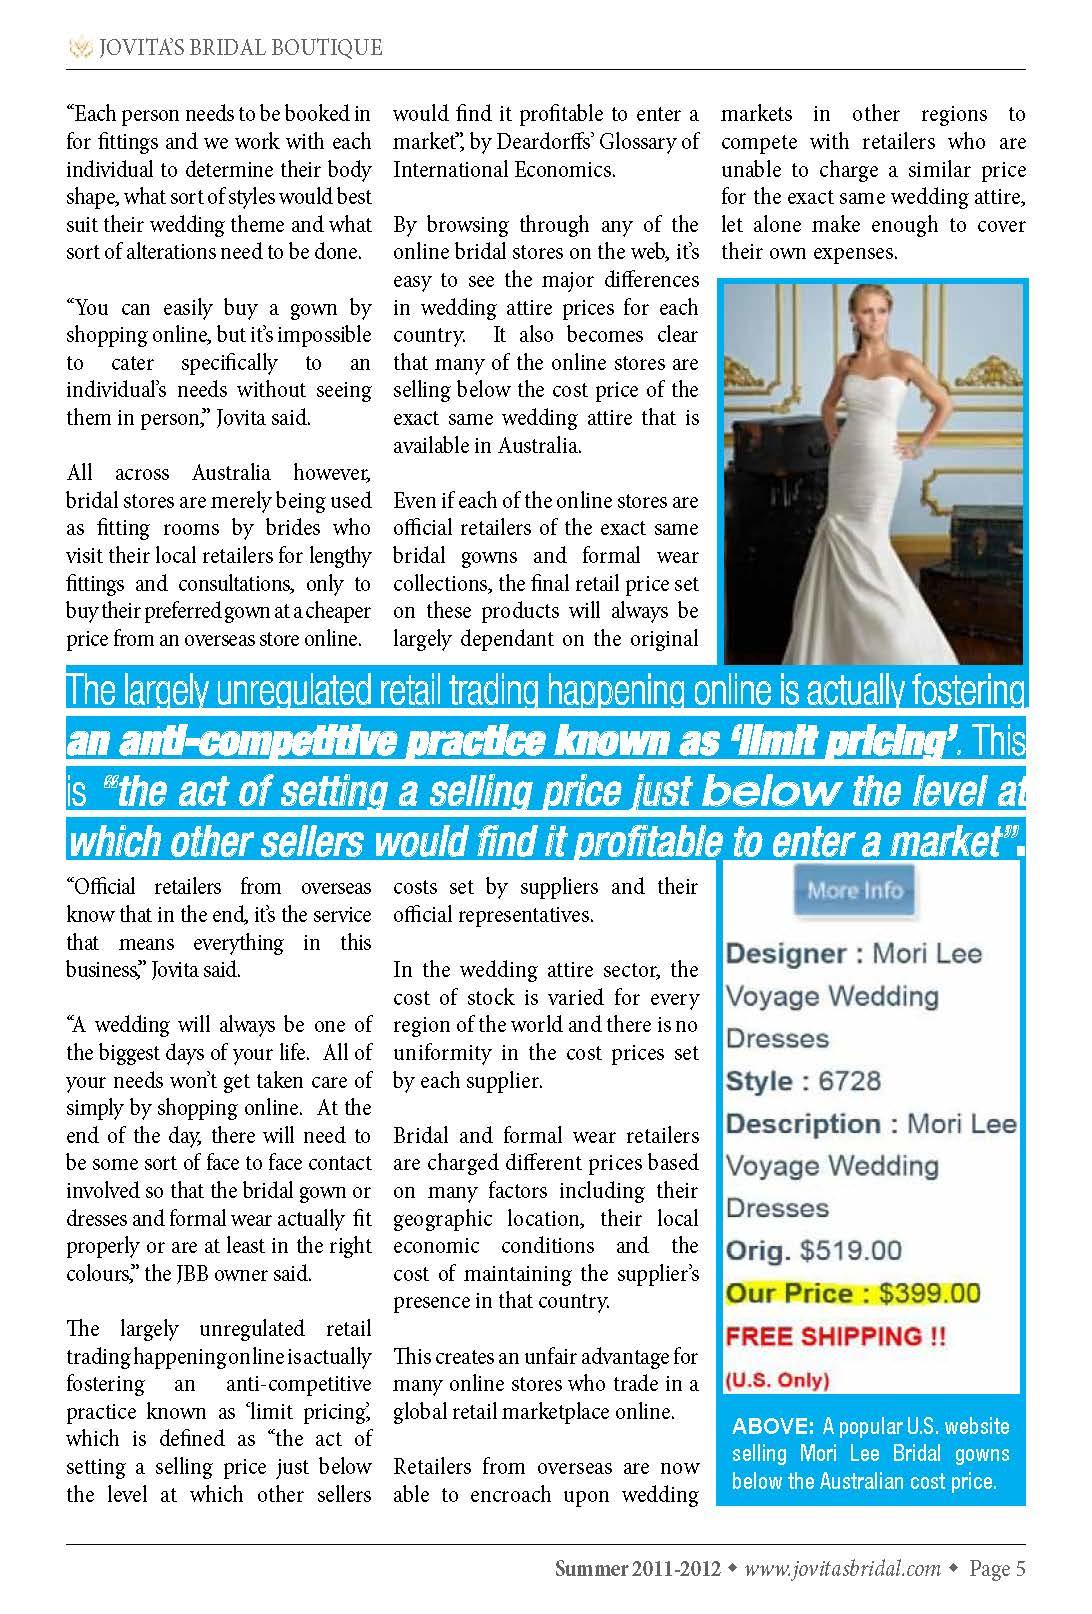 JBB_Newsletter_Summer_2012-EDM_Page_5.jpg